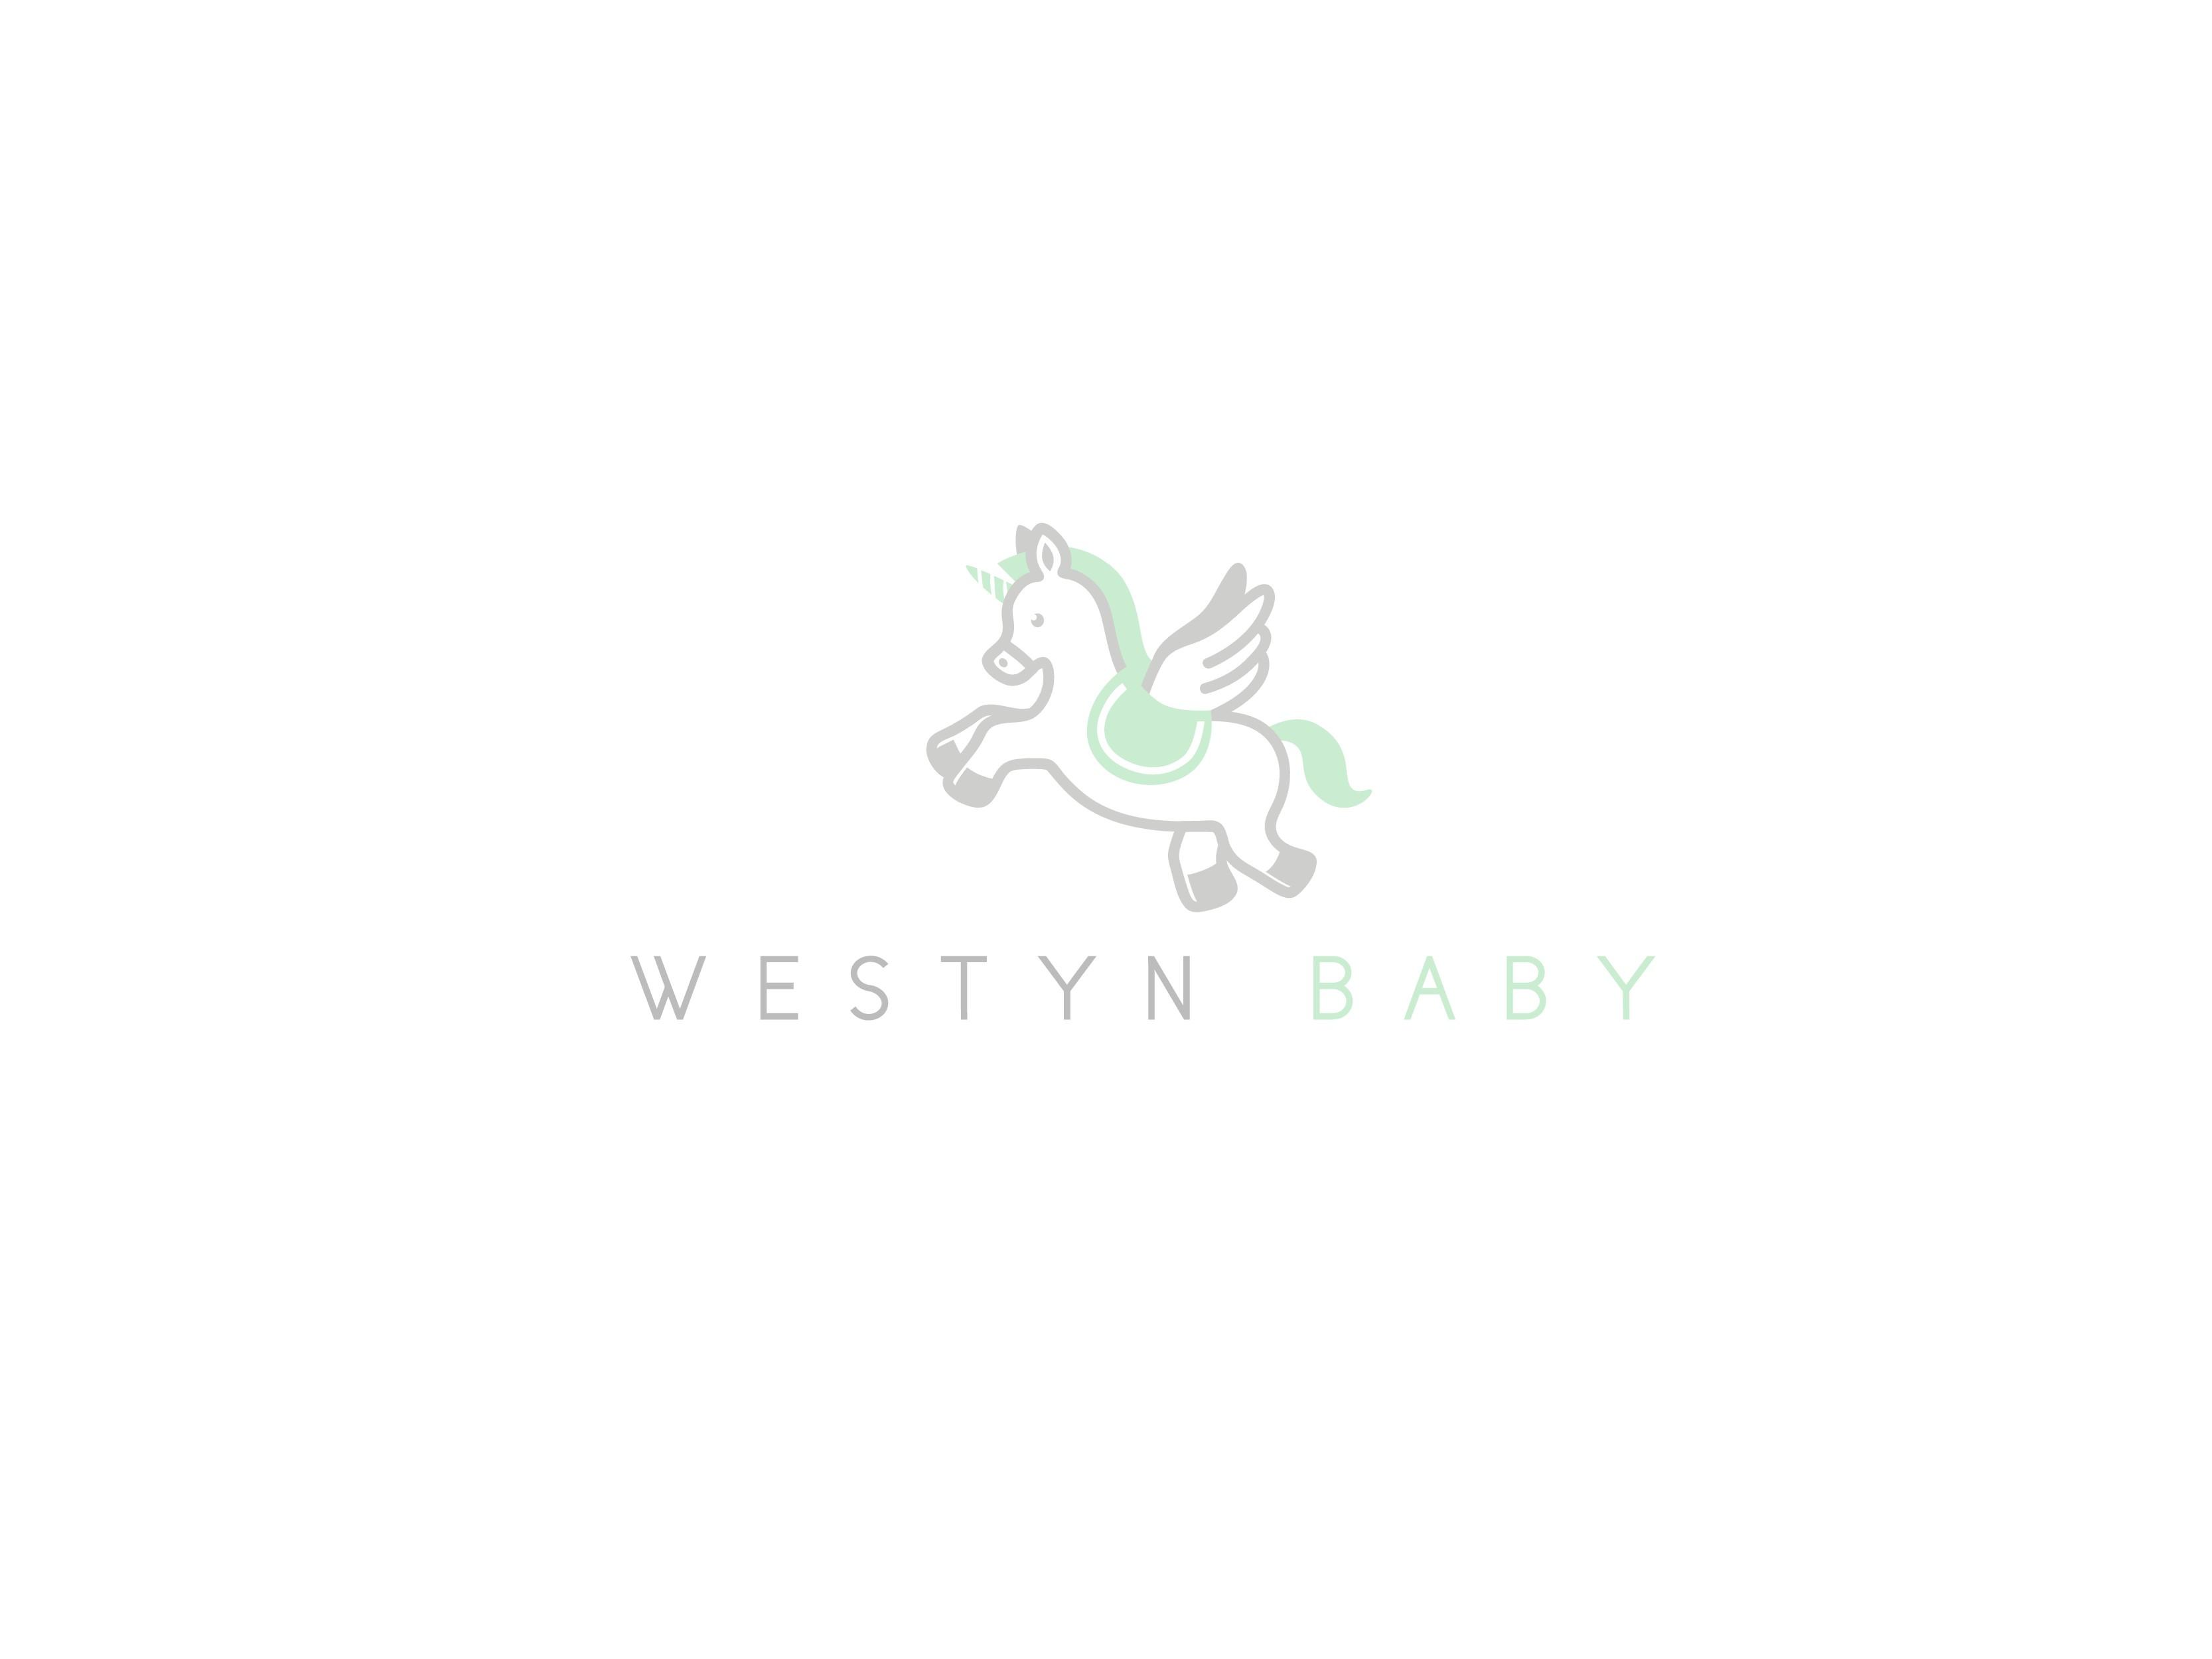 Logo design for luxury baby clothing brand, Westyn Baby!